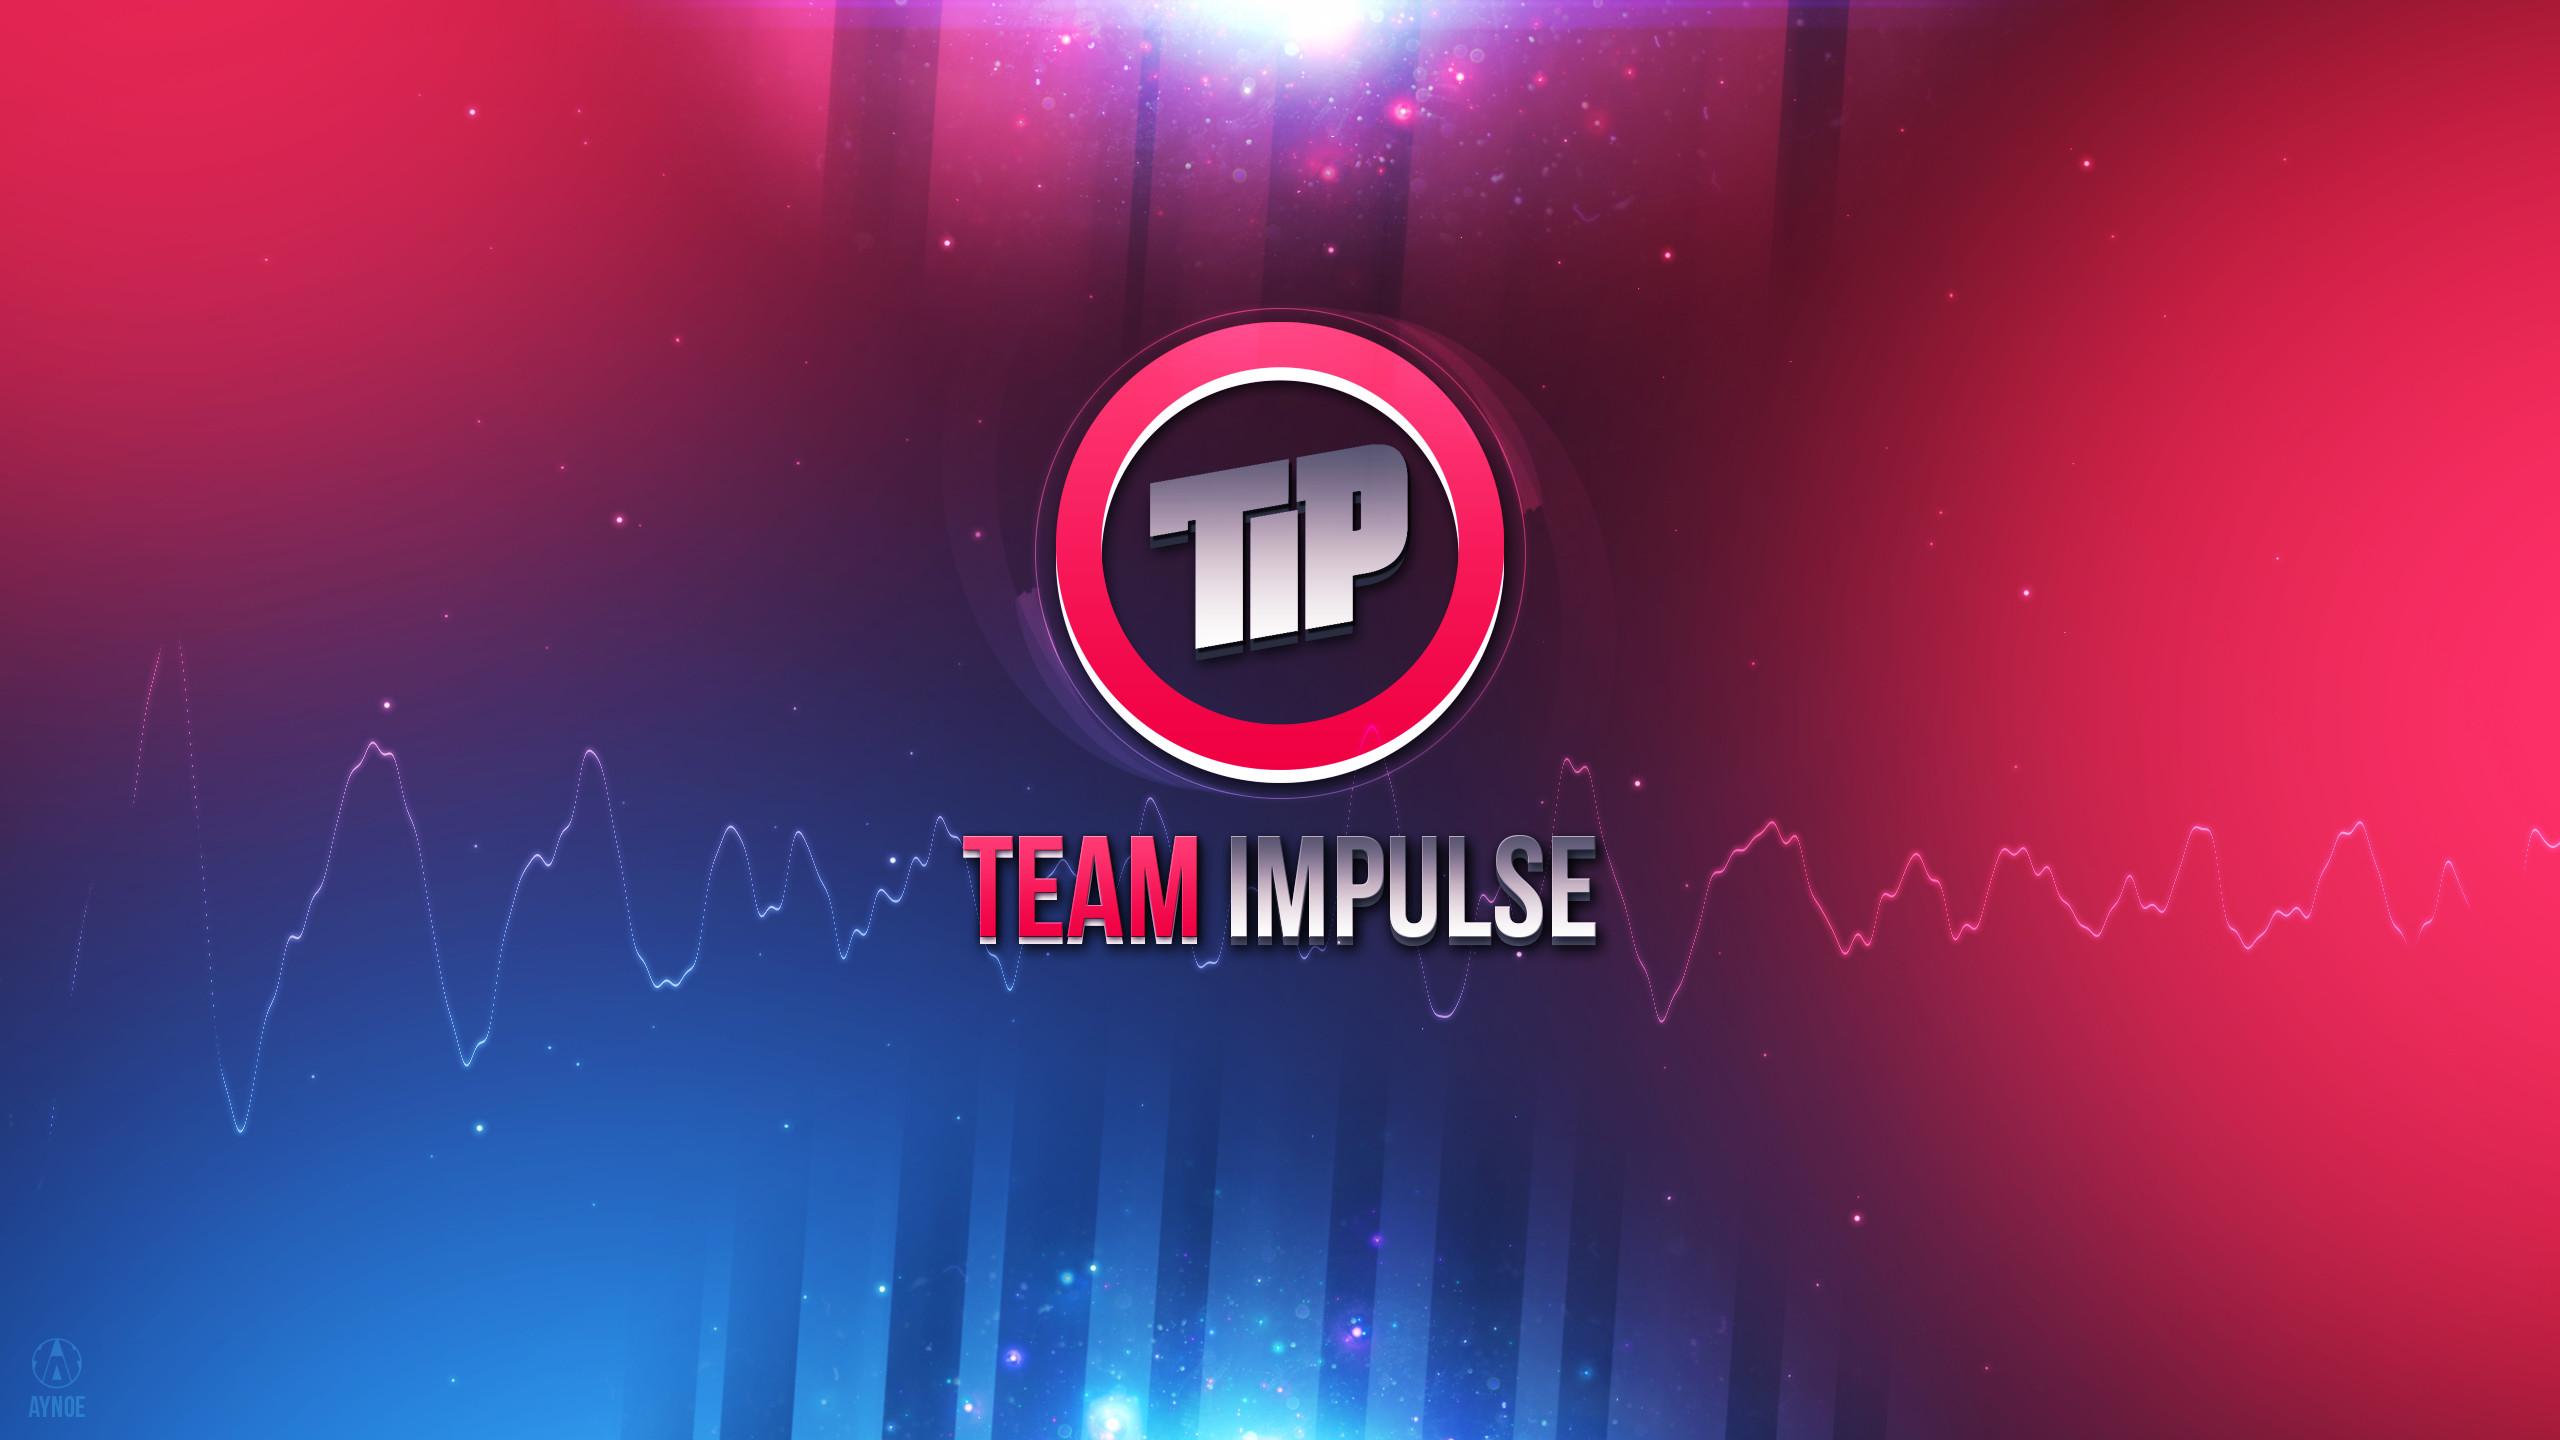 … Team Impulse Wallpaper Logo – League of Legends by Aynoe